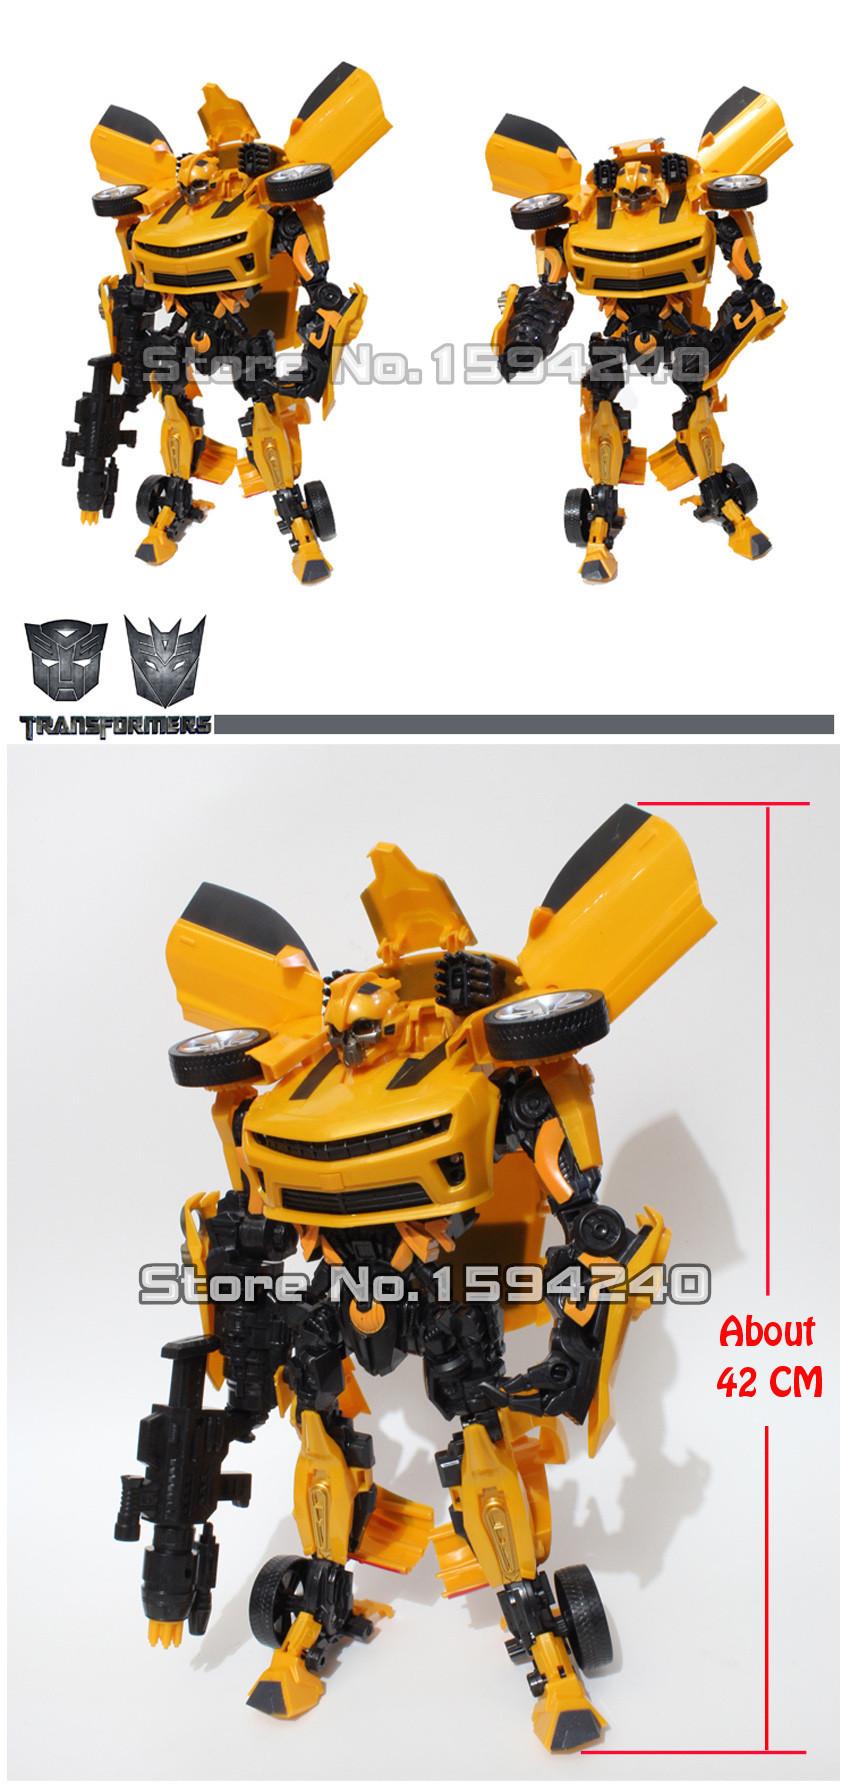 AA1 Action Figure toys 42cm robot Bumblebee Robocar car model Toys for children Education brinquedos meninos